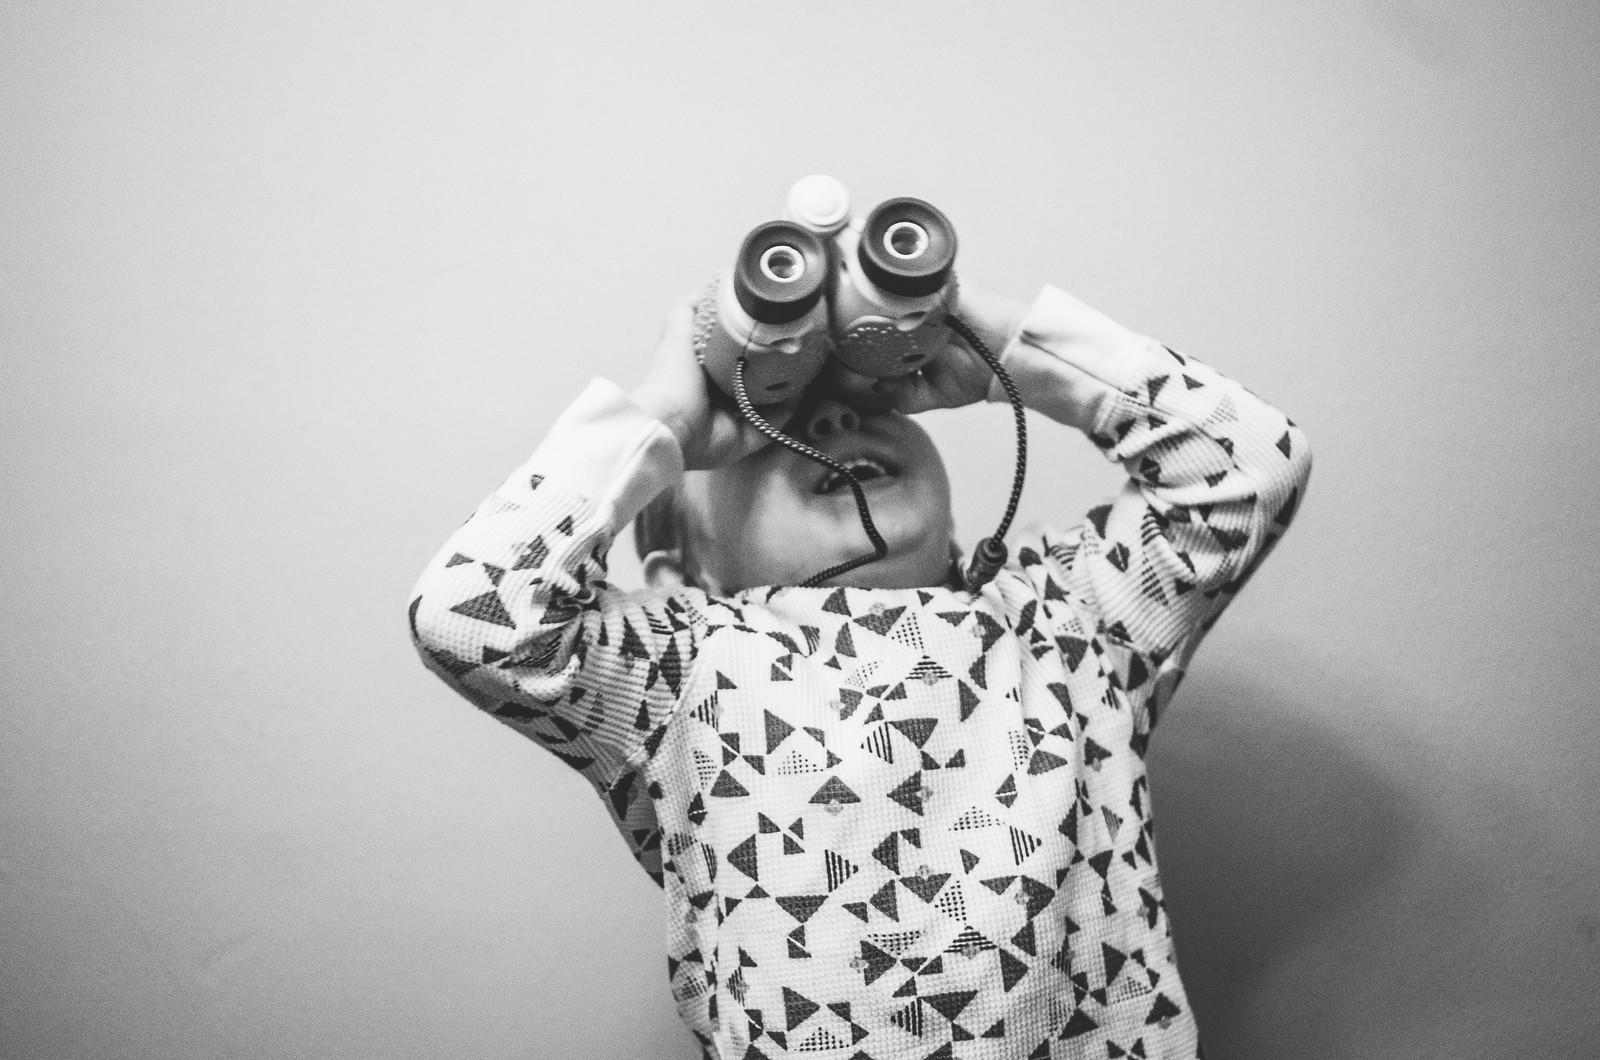 Binocular Boy